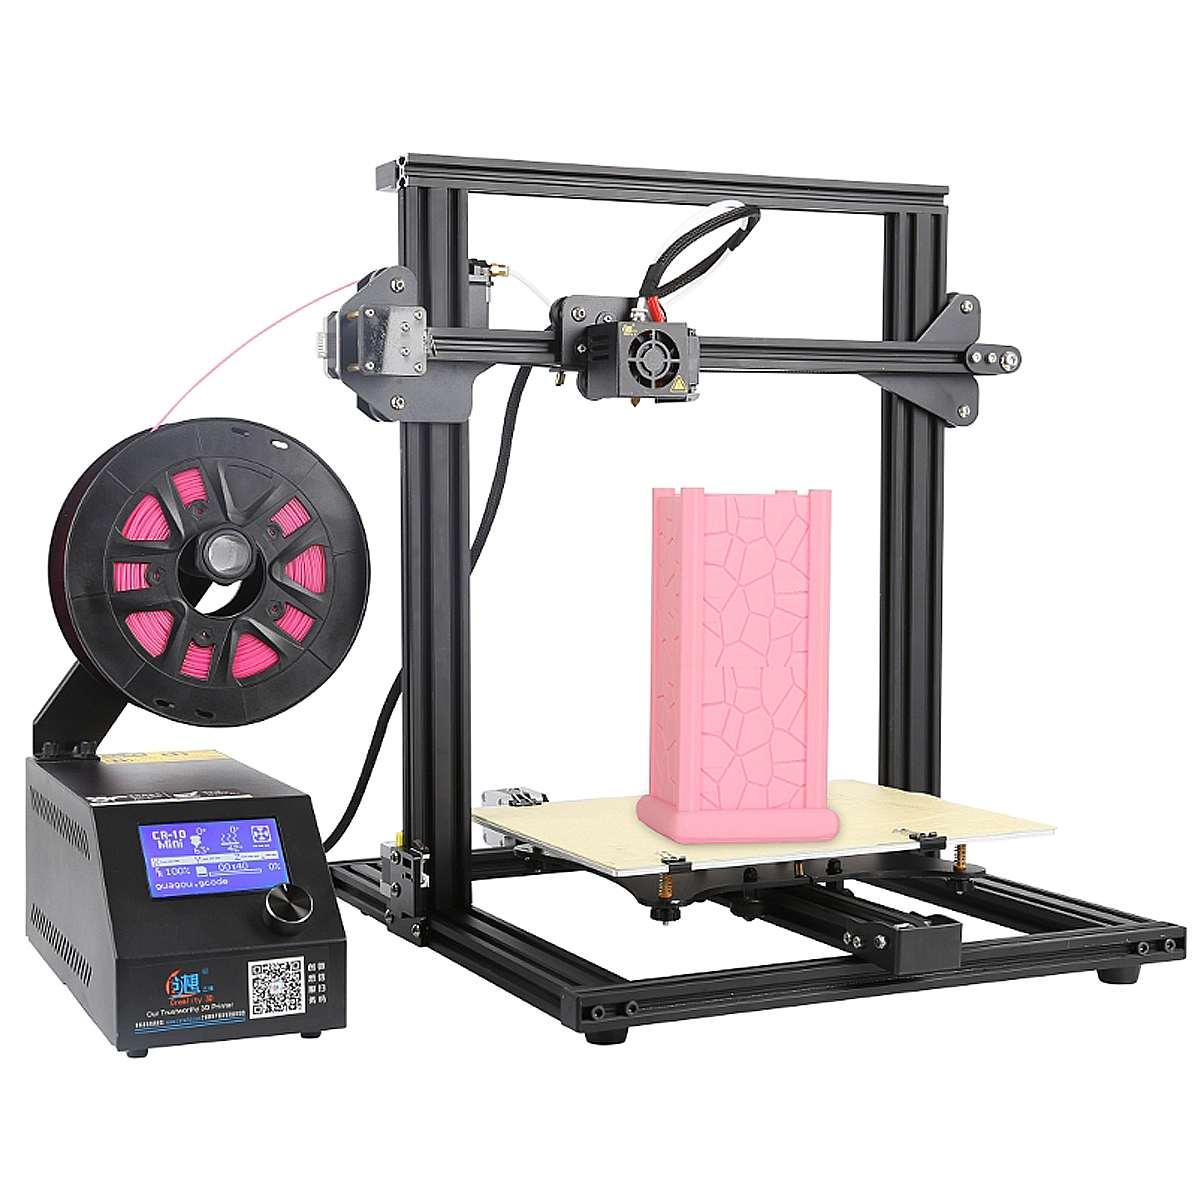 CR-10 Mini FAI DA TE 3D Kit Stampante Supporto Curriculum di Stampa 300*220*300mm di Grande Formato di Stampa 1.75mm 0.4mm Ugello